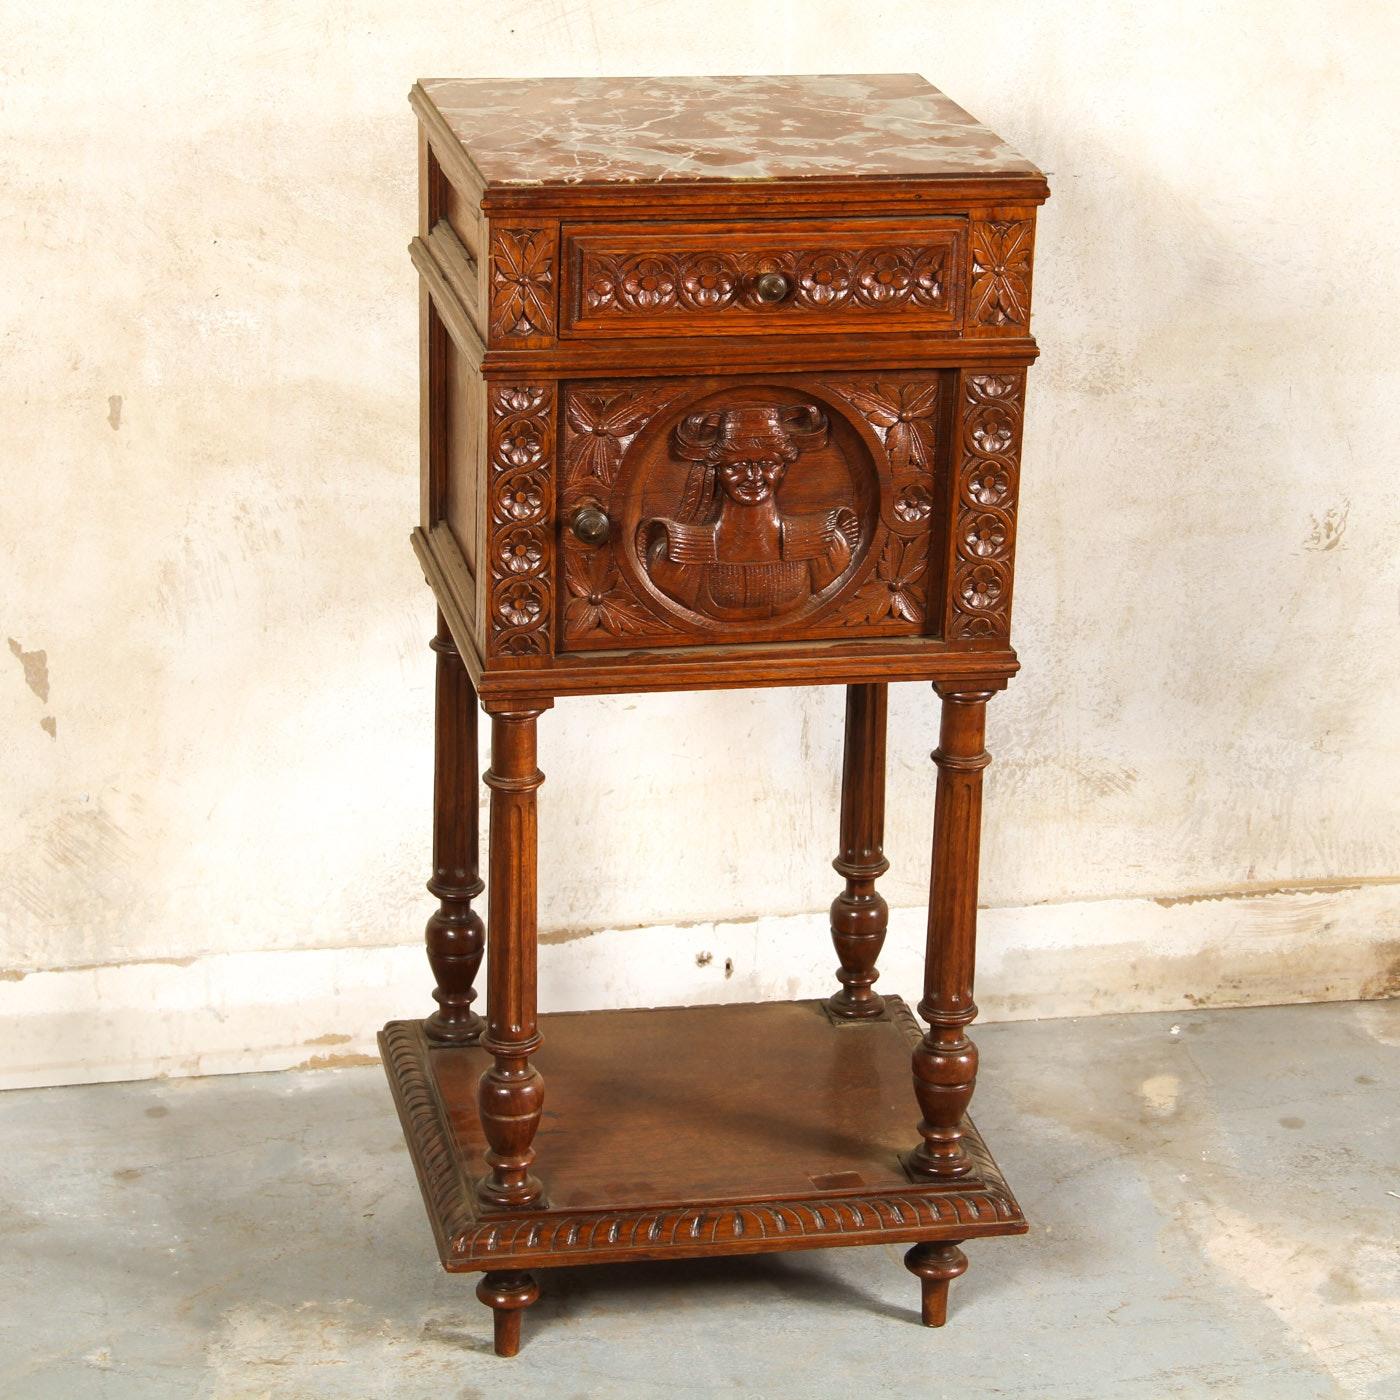 Vintage Henri II Style Walnut Nightstand With Marble Top